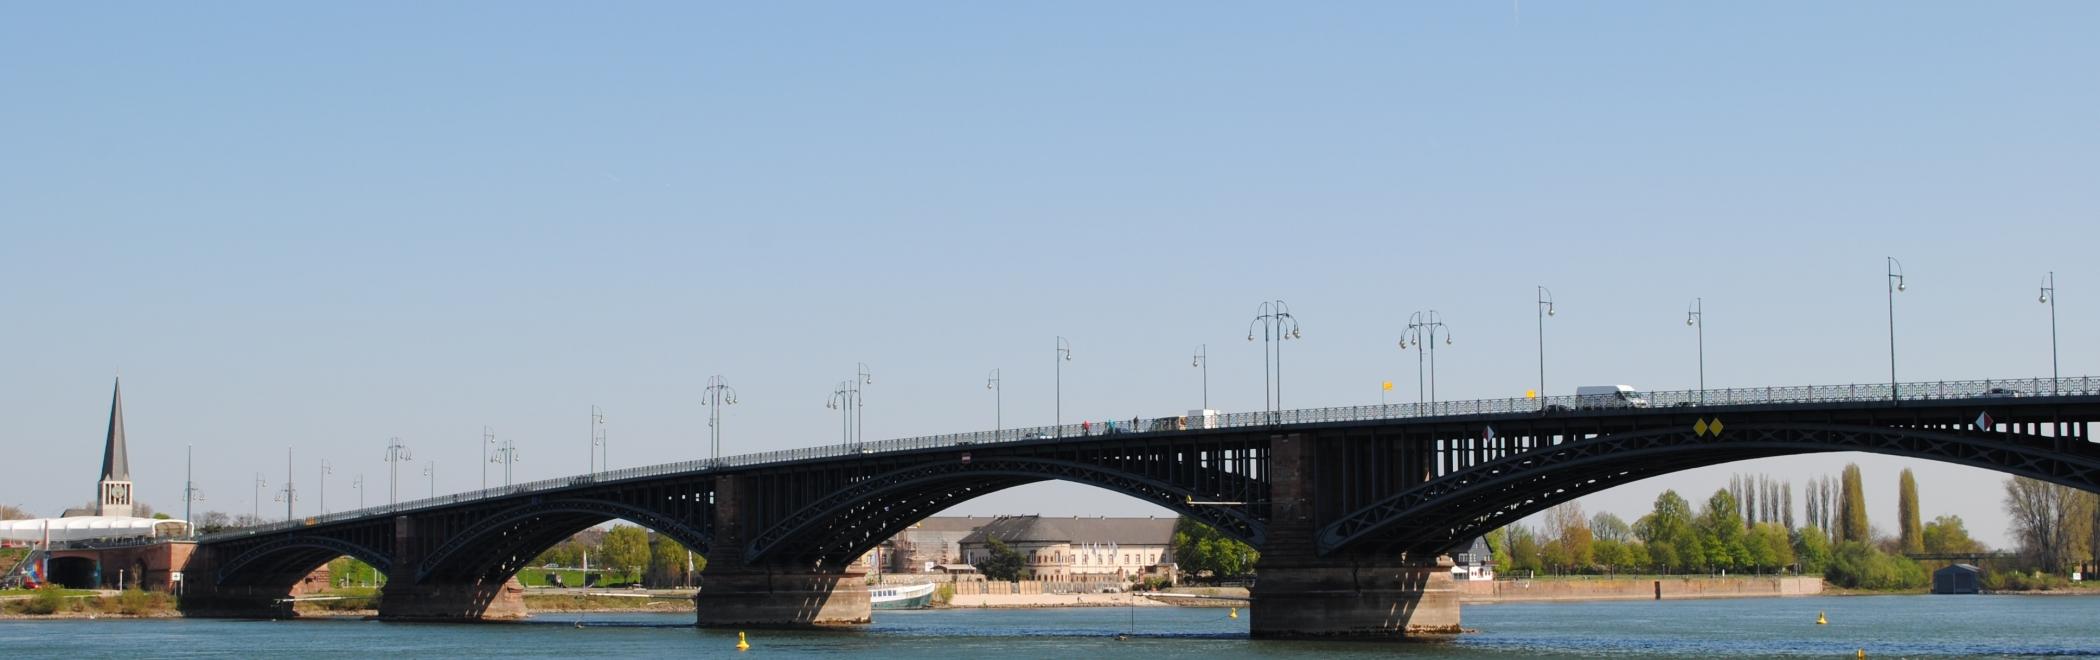 Rhein-Dom-Theodor-Heuss-Brücke